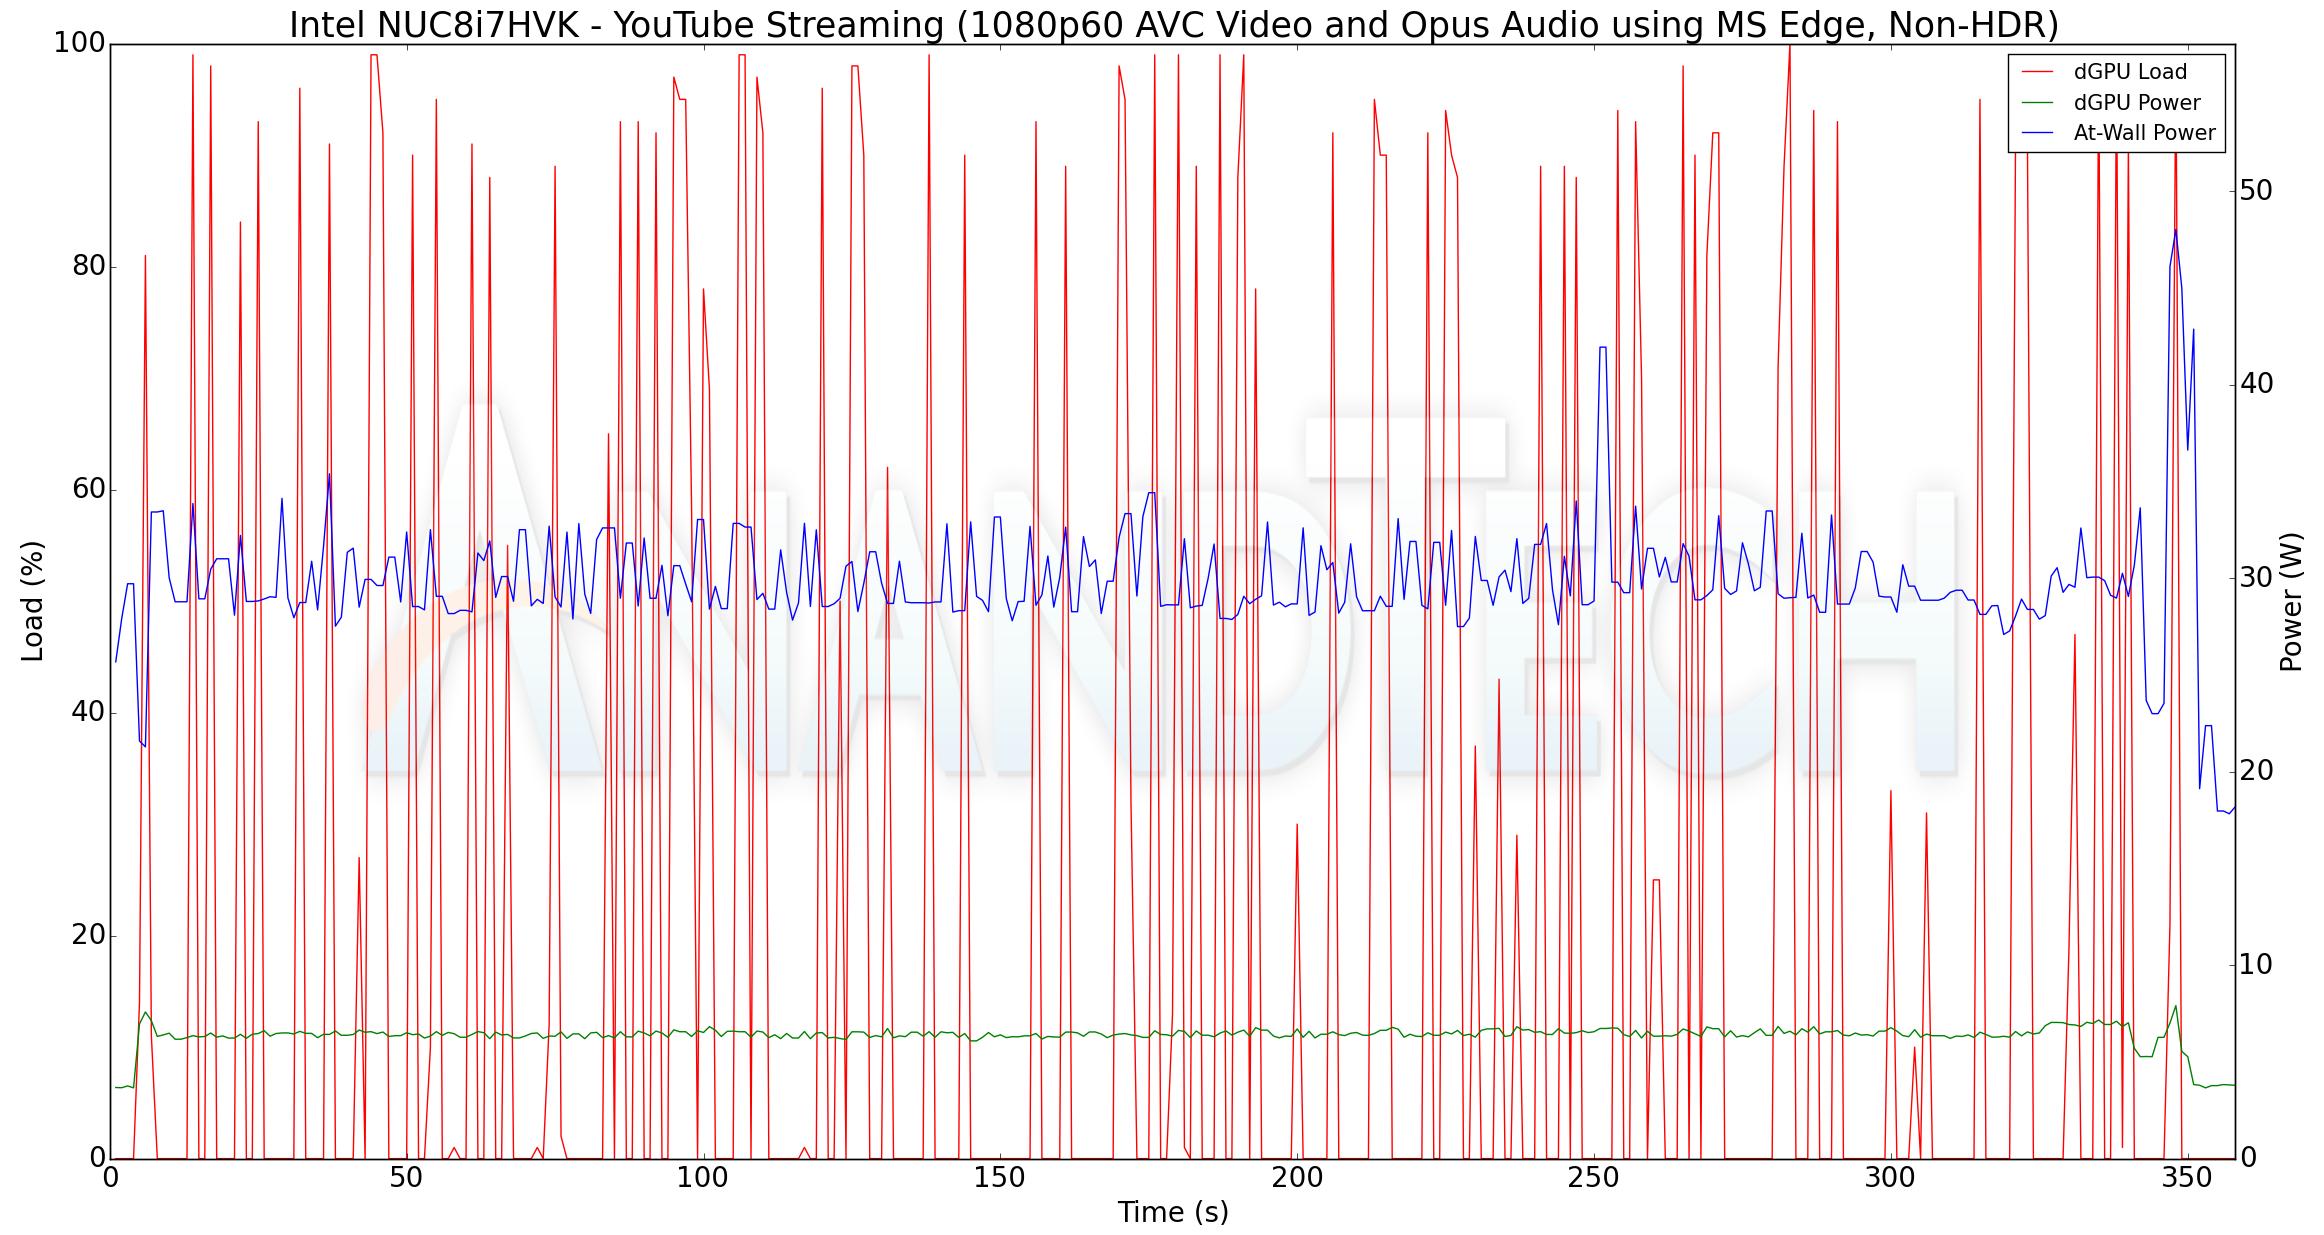 4K HTPC Credentials - The Intel NUC8i7HVK (Hades Canyon